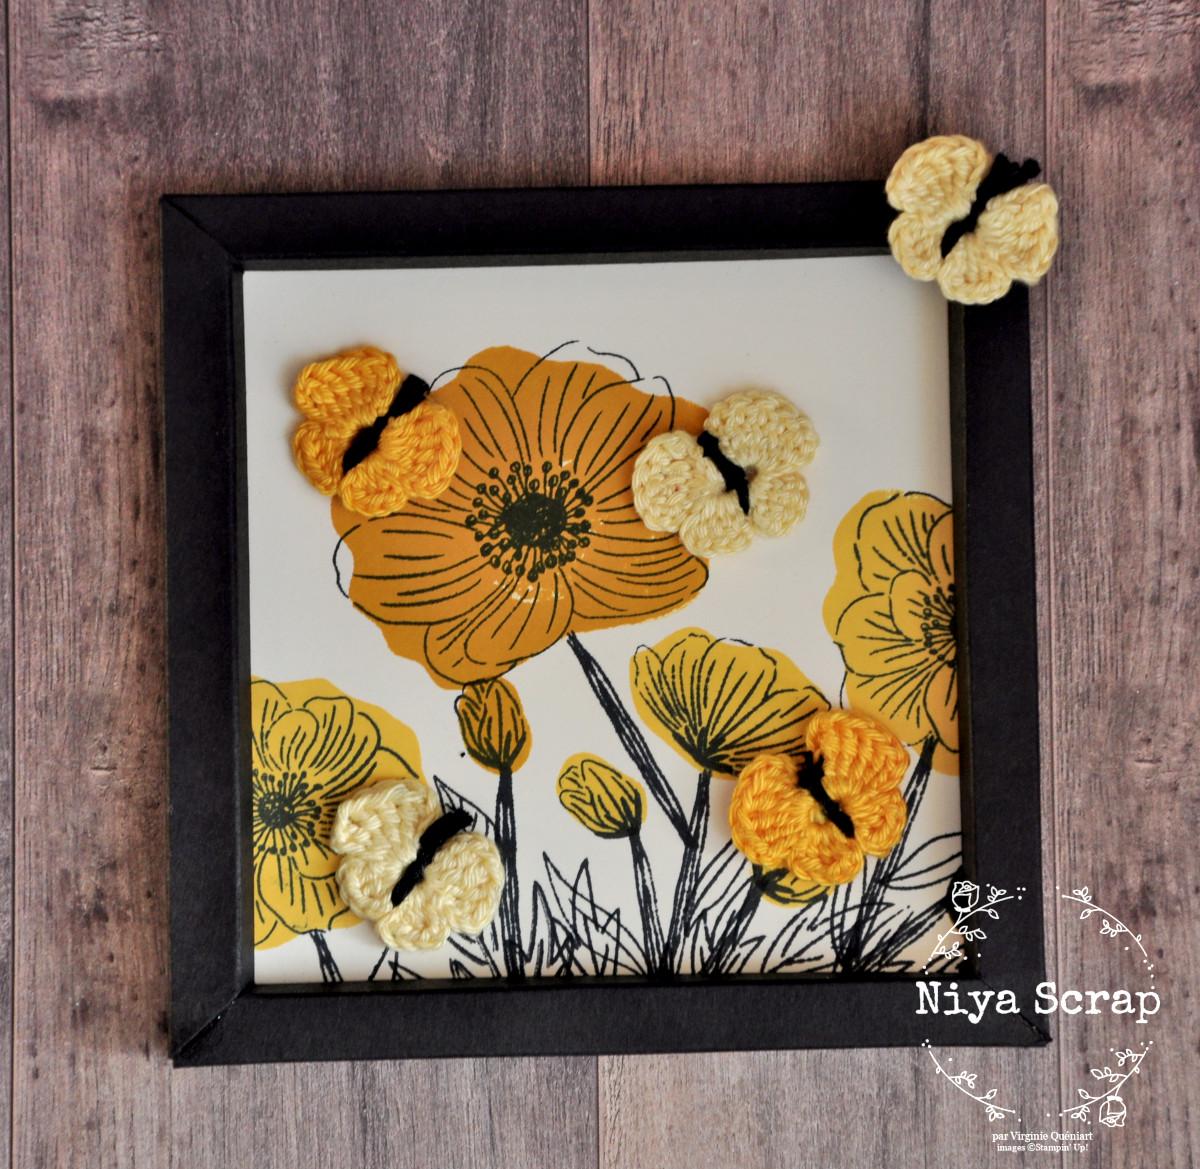 Niya Scrap - Cadre Papillons et Fleurs jaunes - Papier et Crochet - Matériel Stampin' Up!